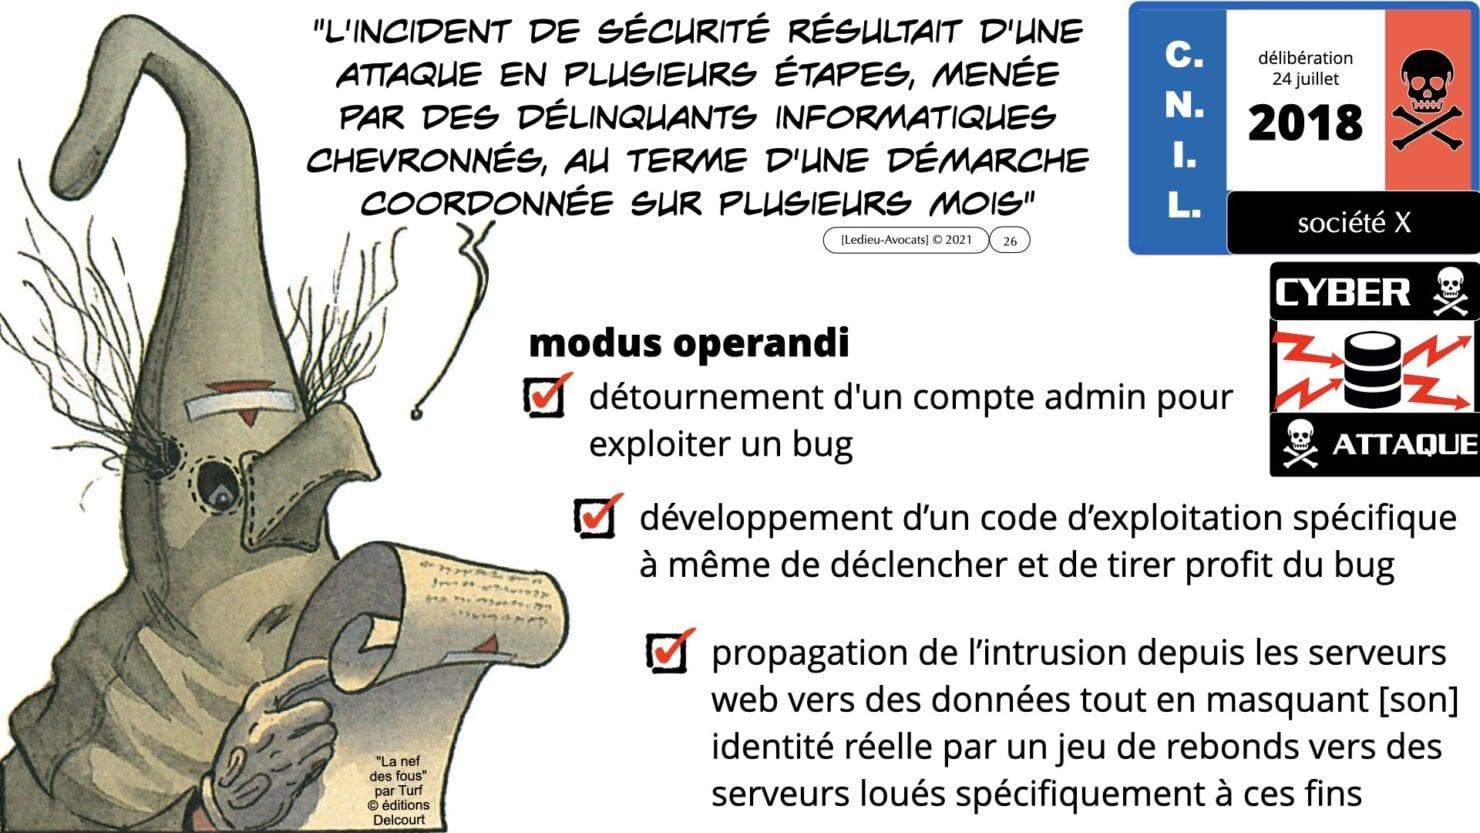 RGPD e-Privacy principes actualité jurisprudence ©Ledieu-Avocats 25-06-2021.026